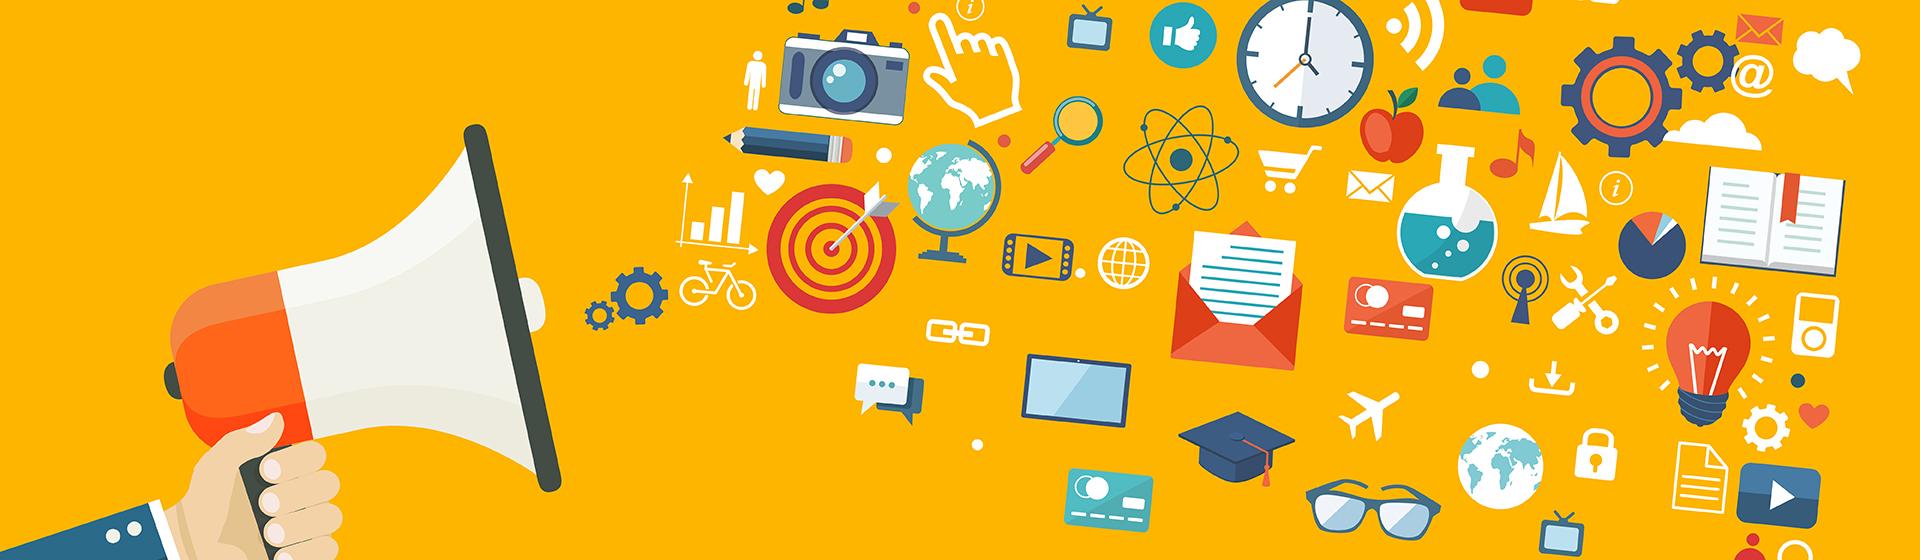 Diocelio goulart marketing digital banner plataforma